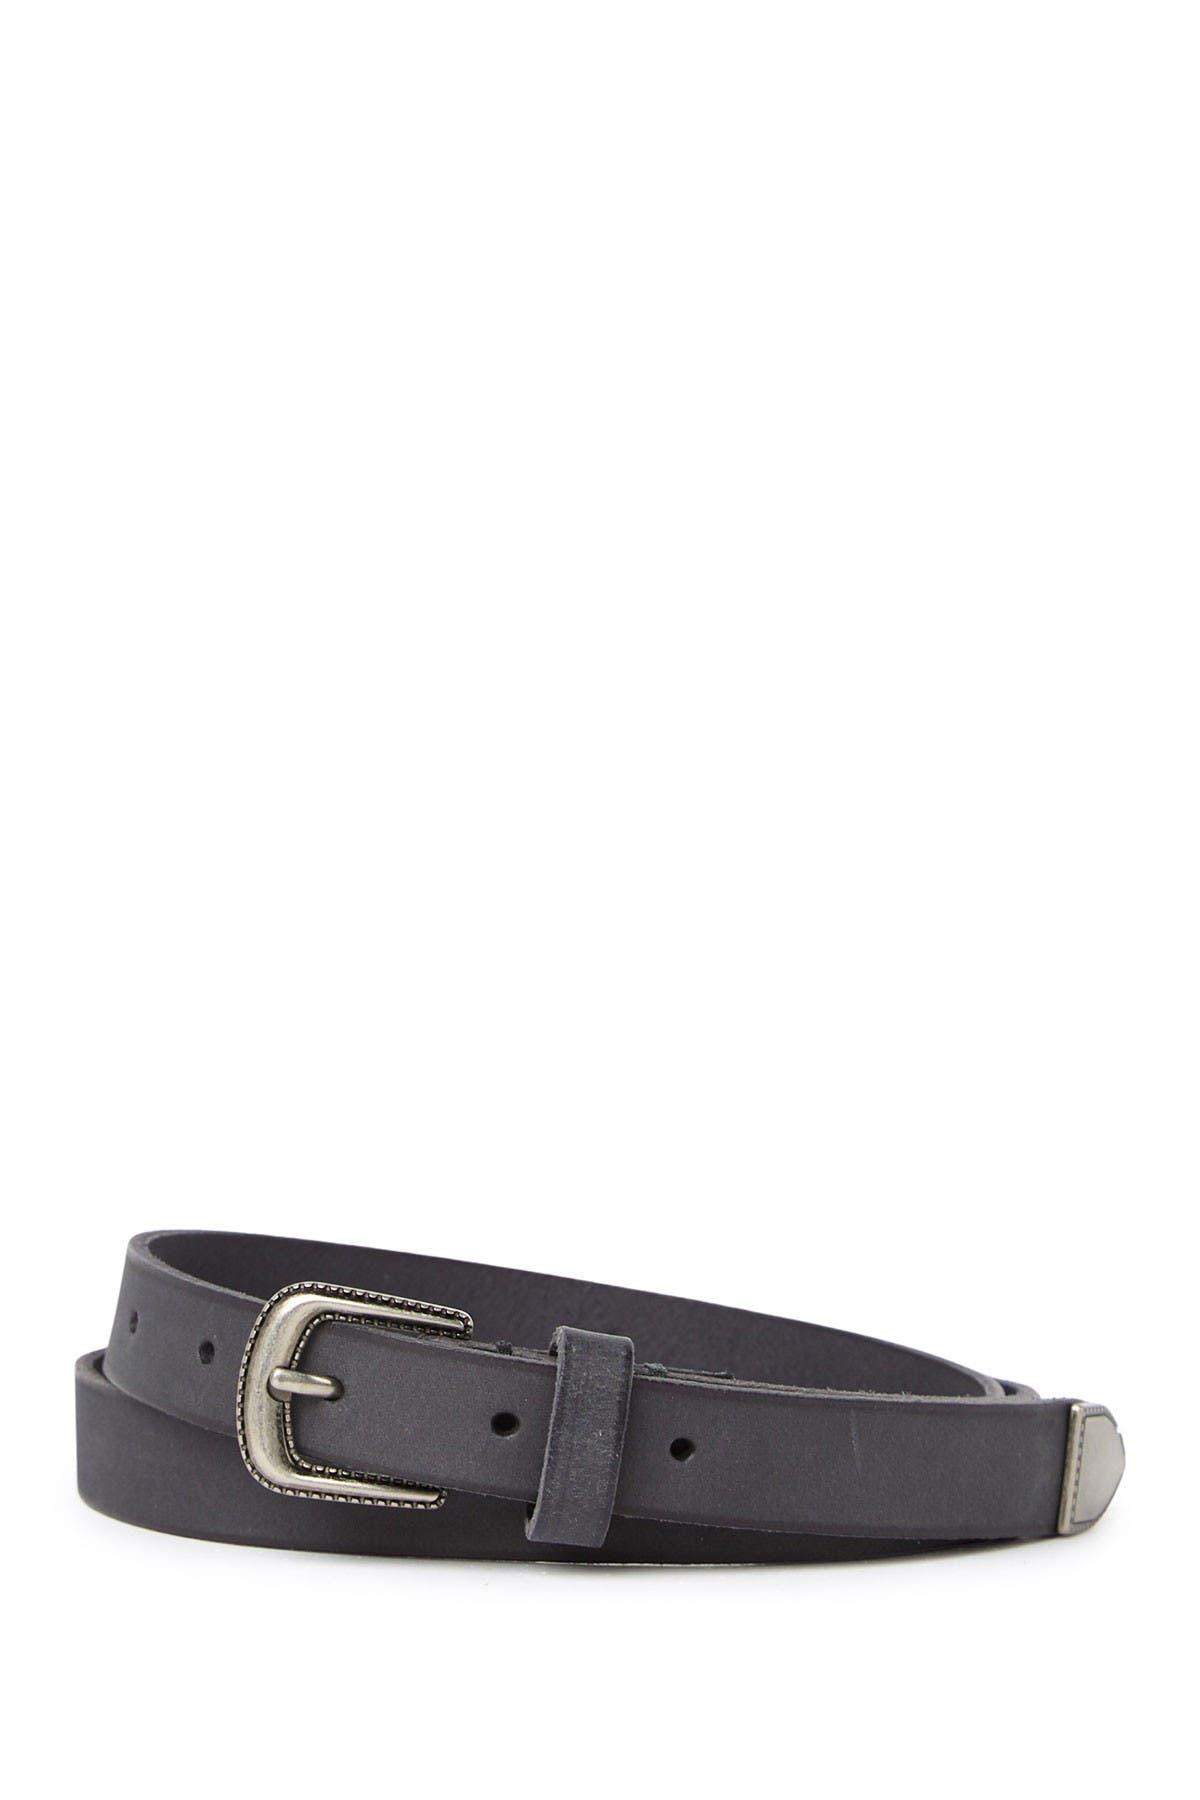 Image of Frye Western Leather Belt